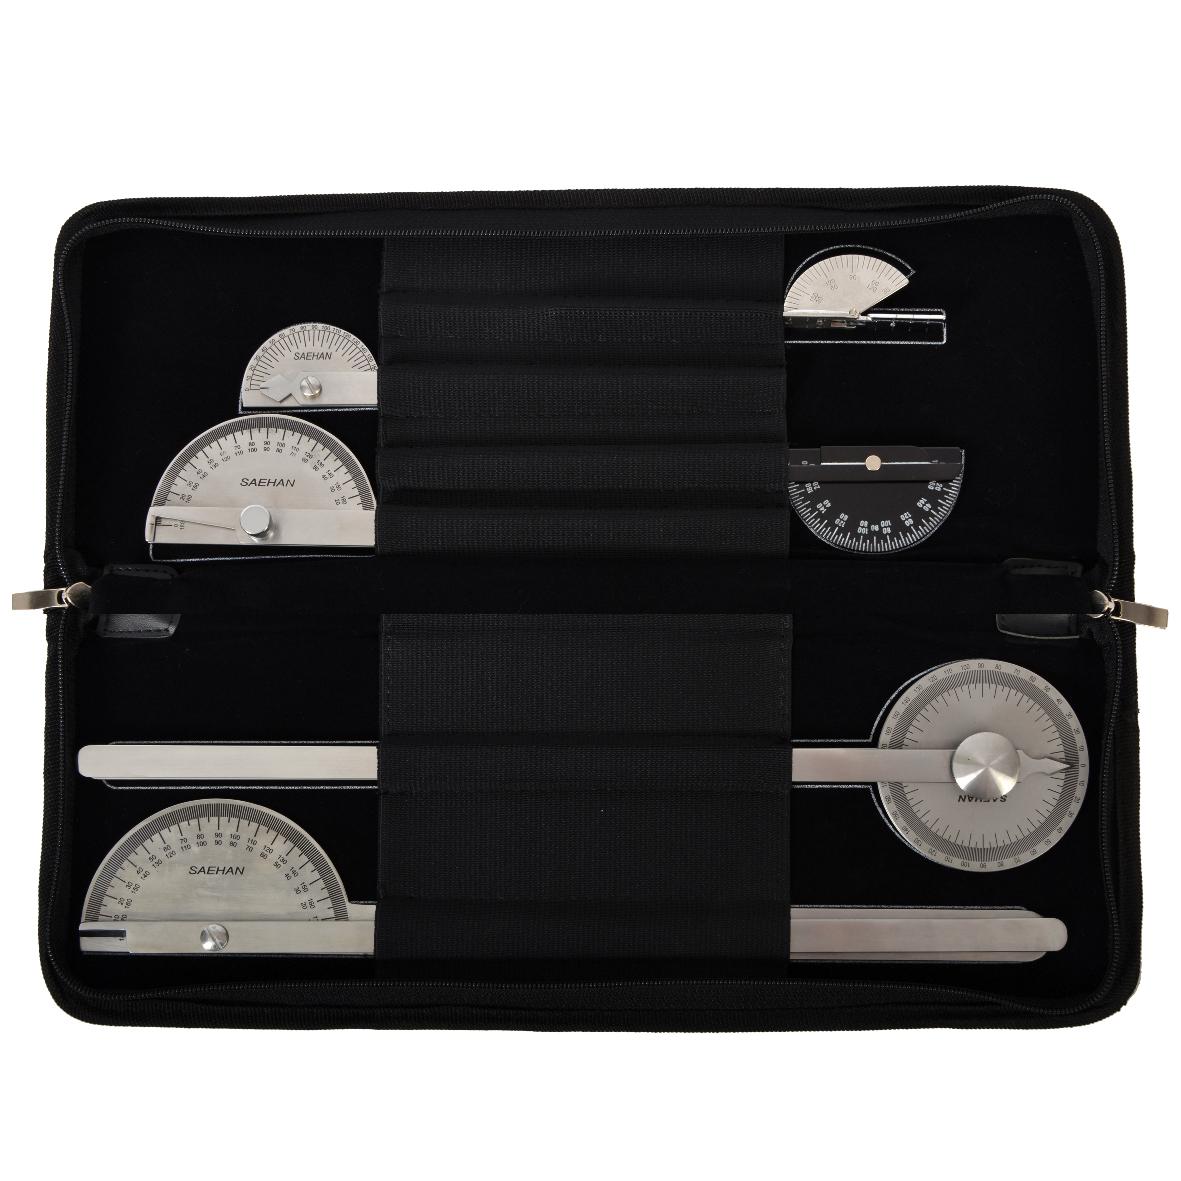 Saehan Goniometer Set i Rostfritt stål 5800211